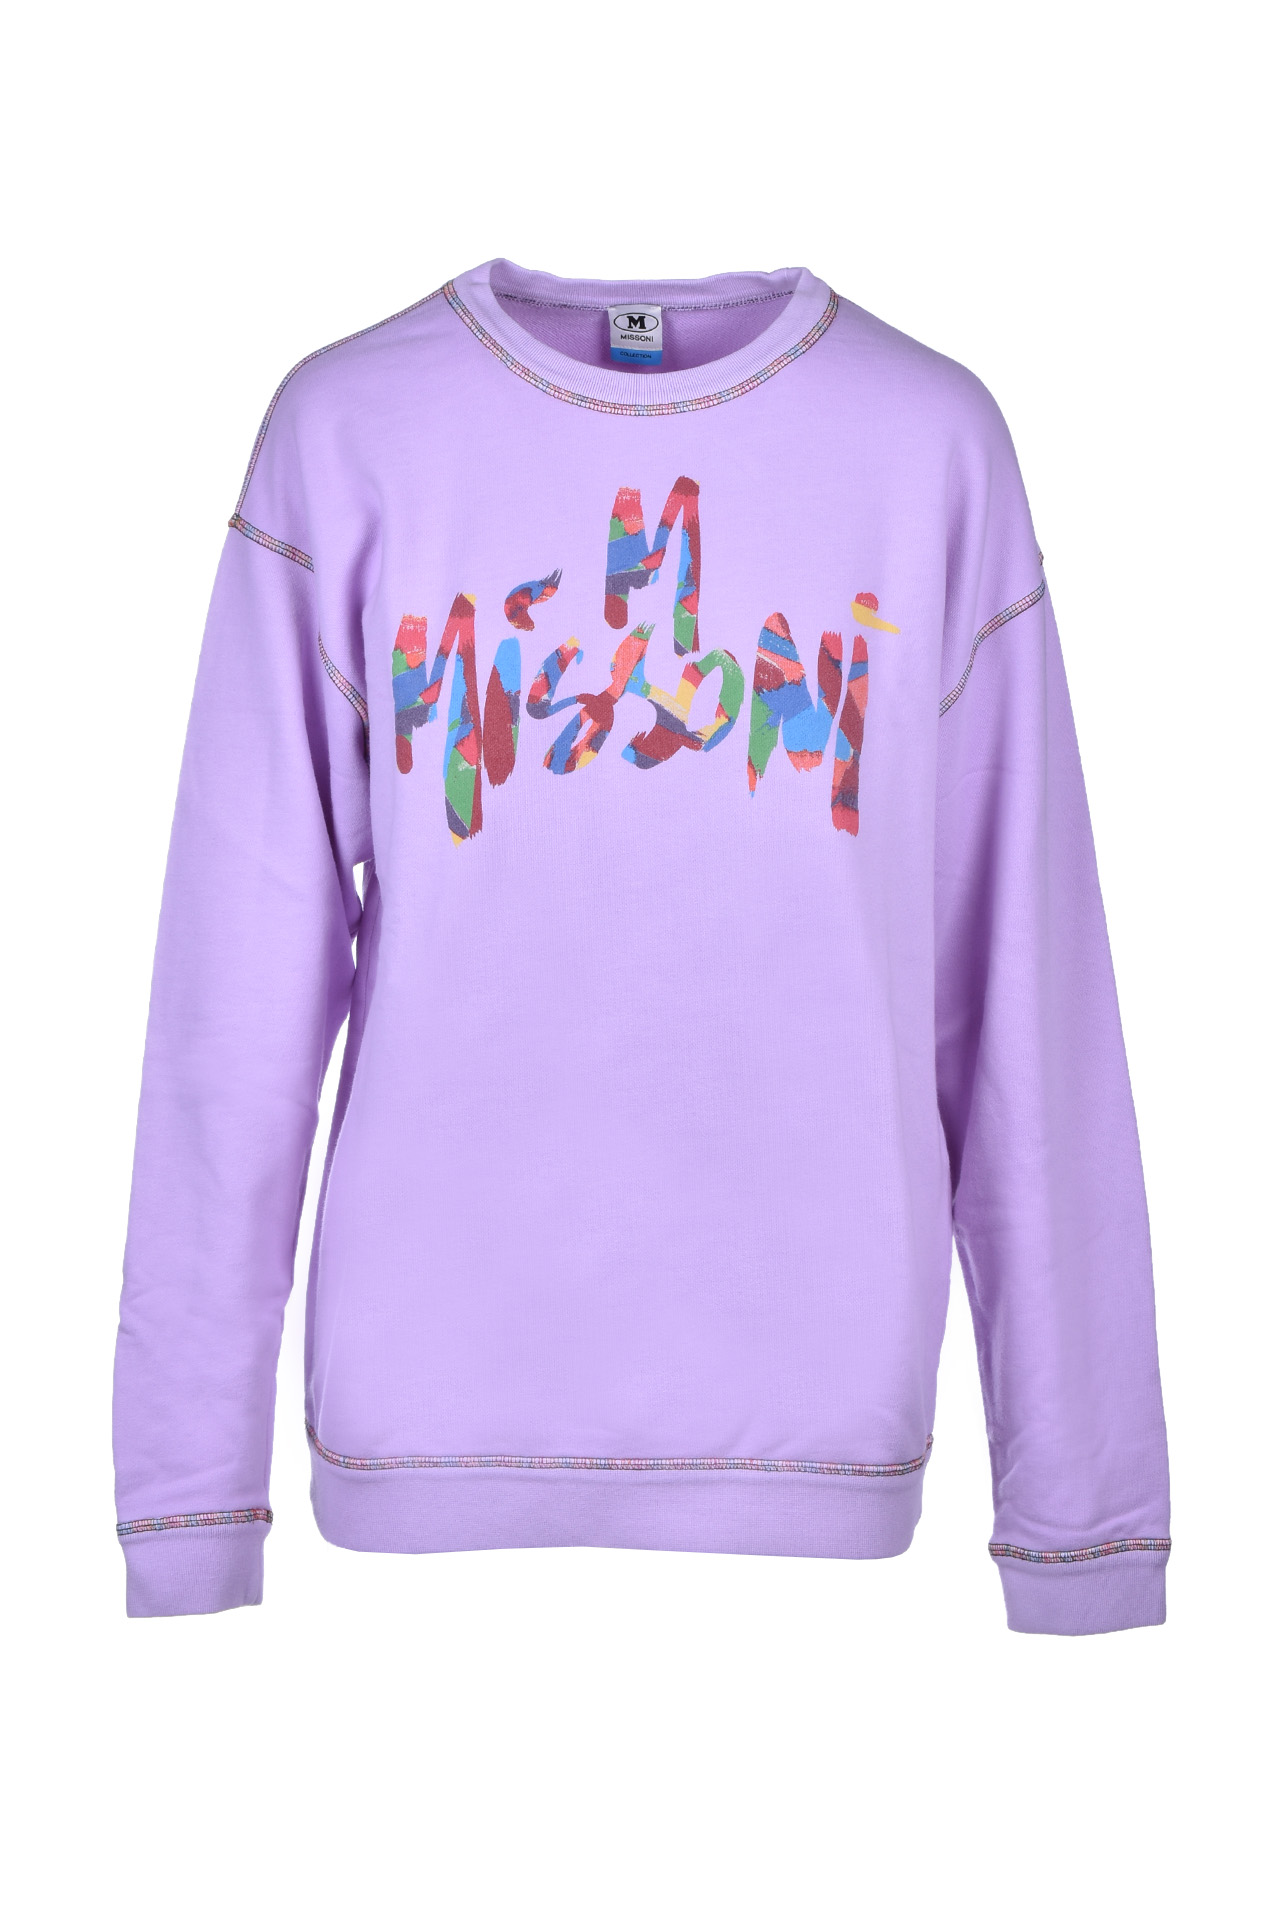 long-sleeved sweatshirt - lavender M MISSONI | Sweatshirt | 2DN001592J002153620